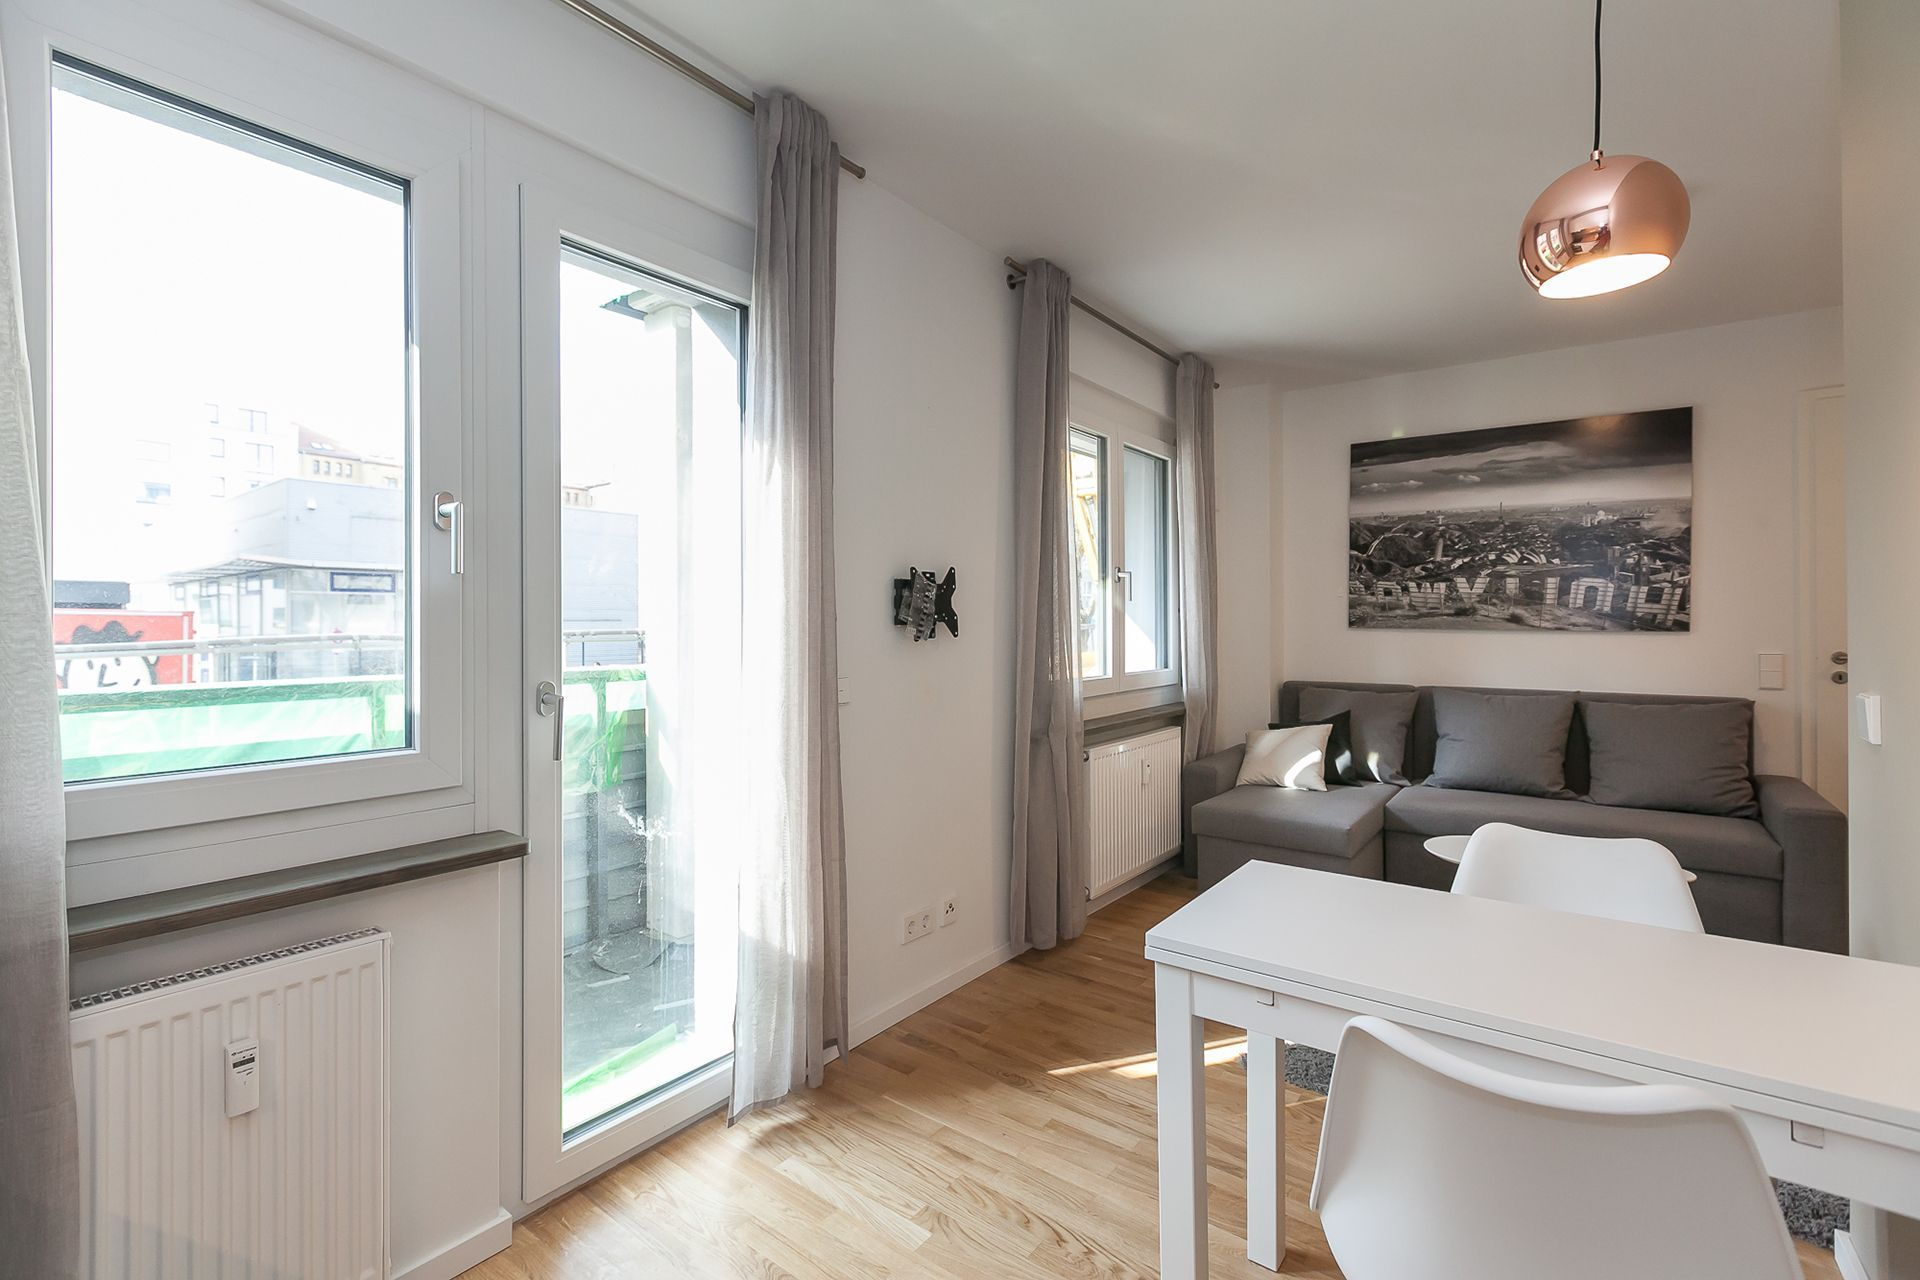 1 Bedroom - Large